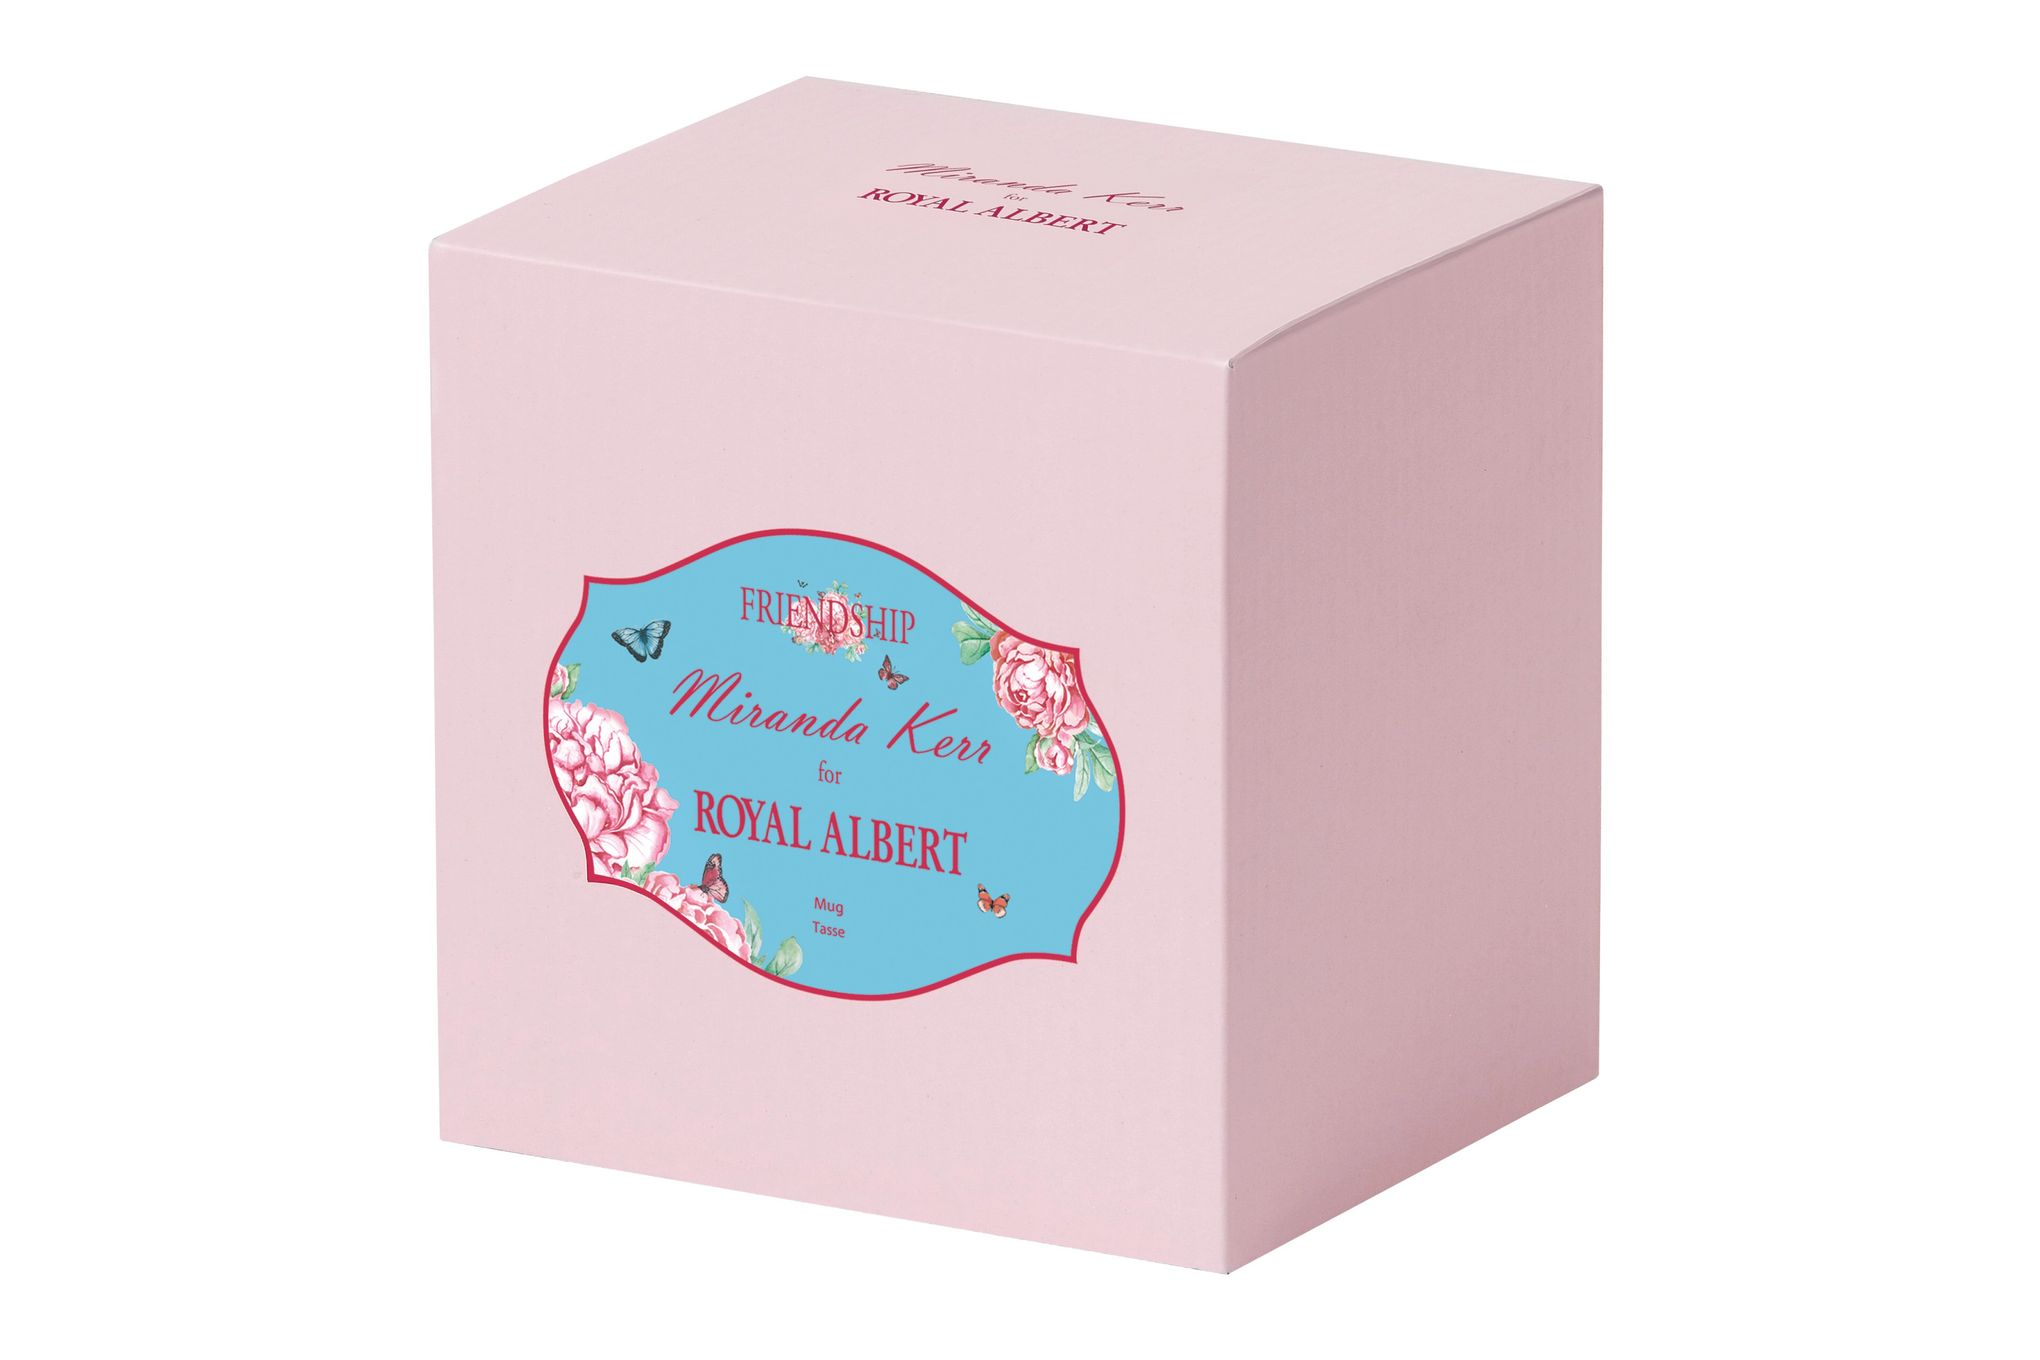 Miranda Kerr for Royal Albert Friendship Mug Turquoise 0.4l thumb 2